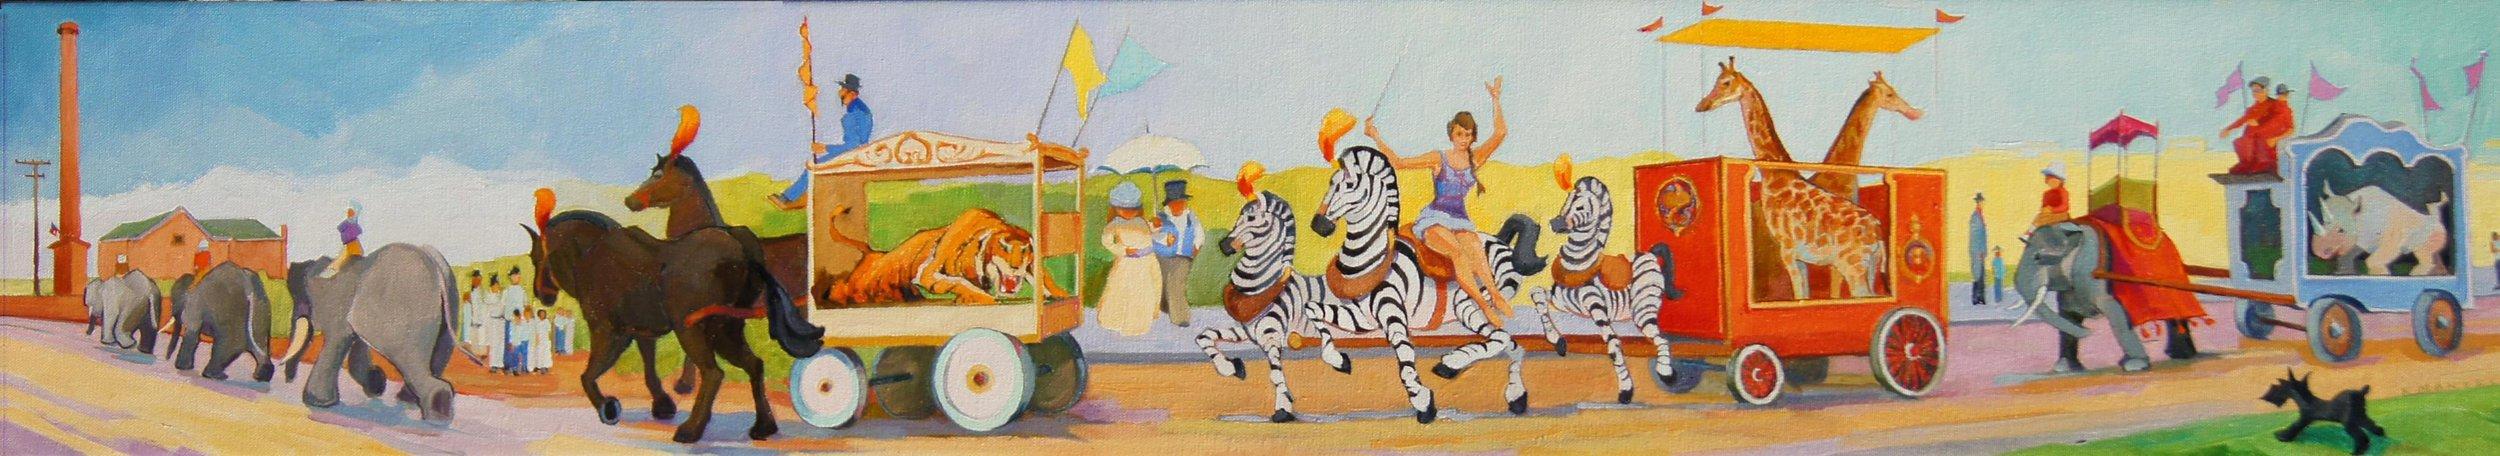 8x44 greeport carousel 2 cropped.jpg